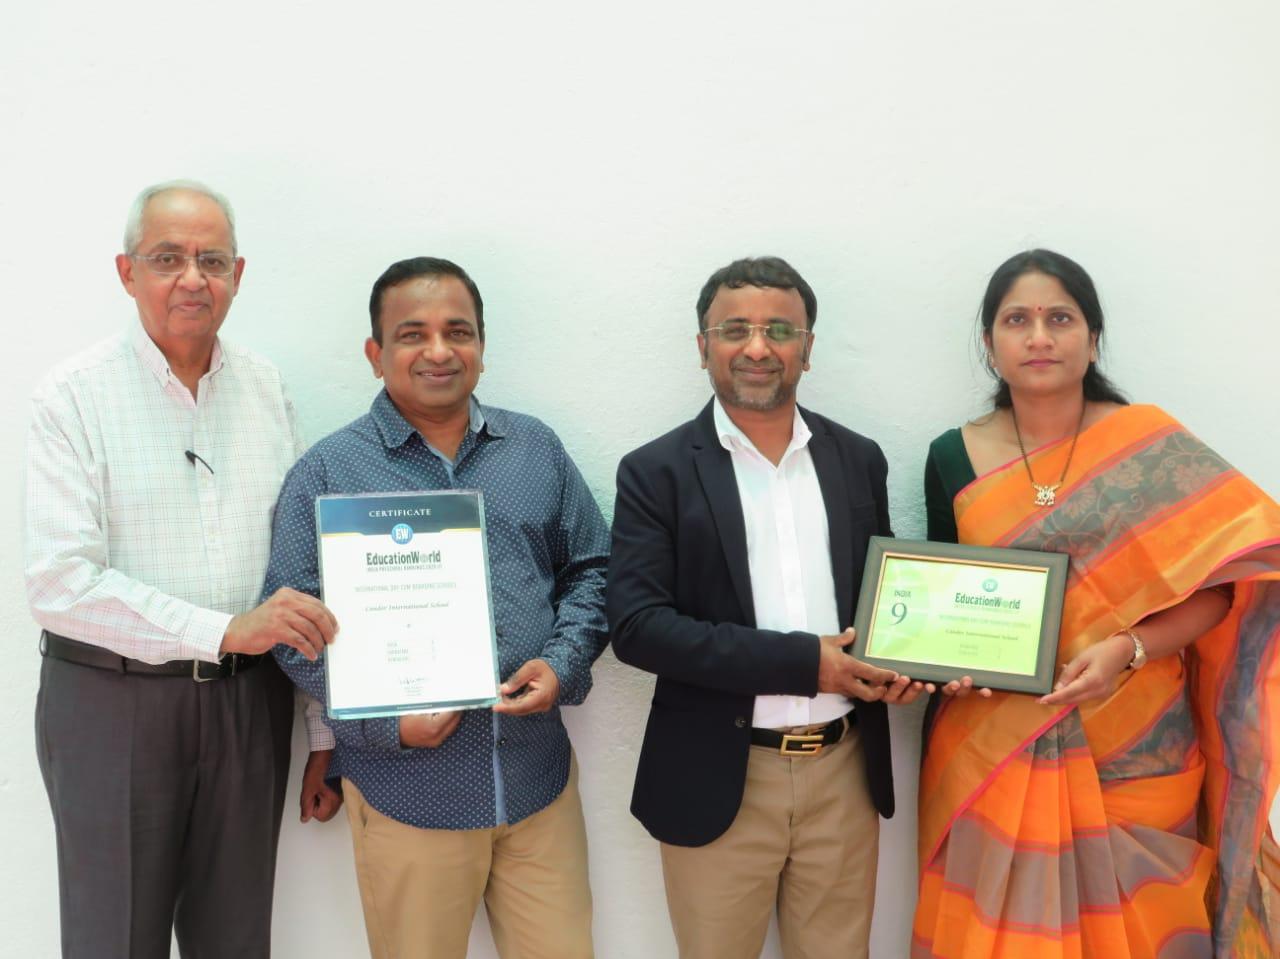 Candor Team with education world awards